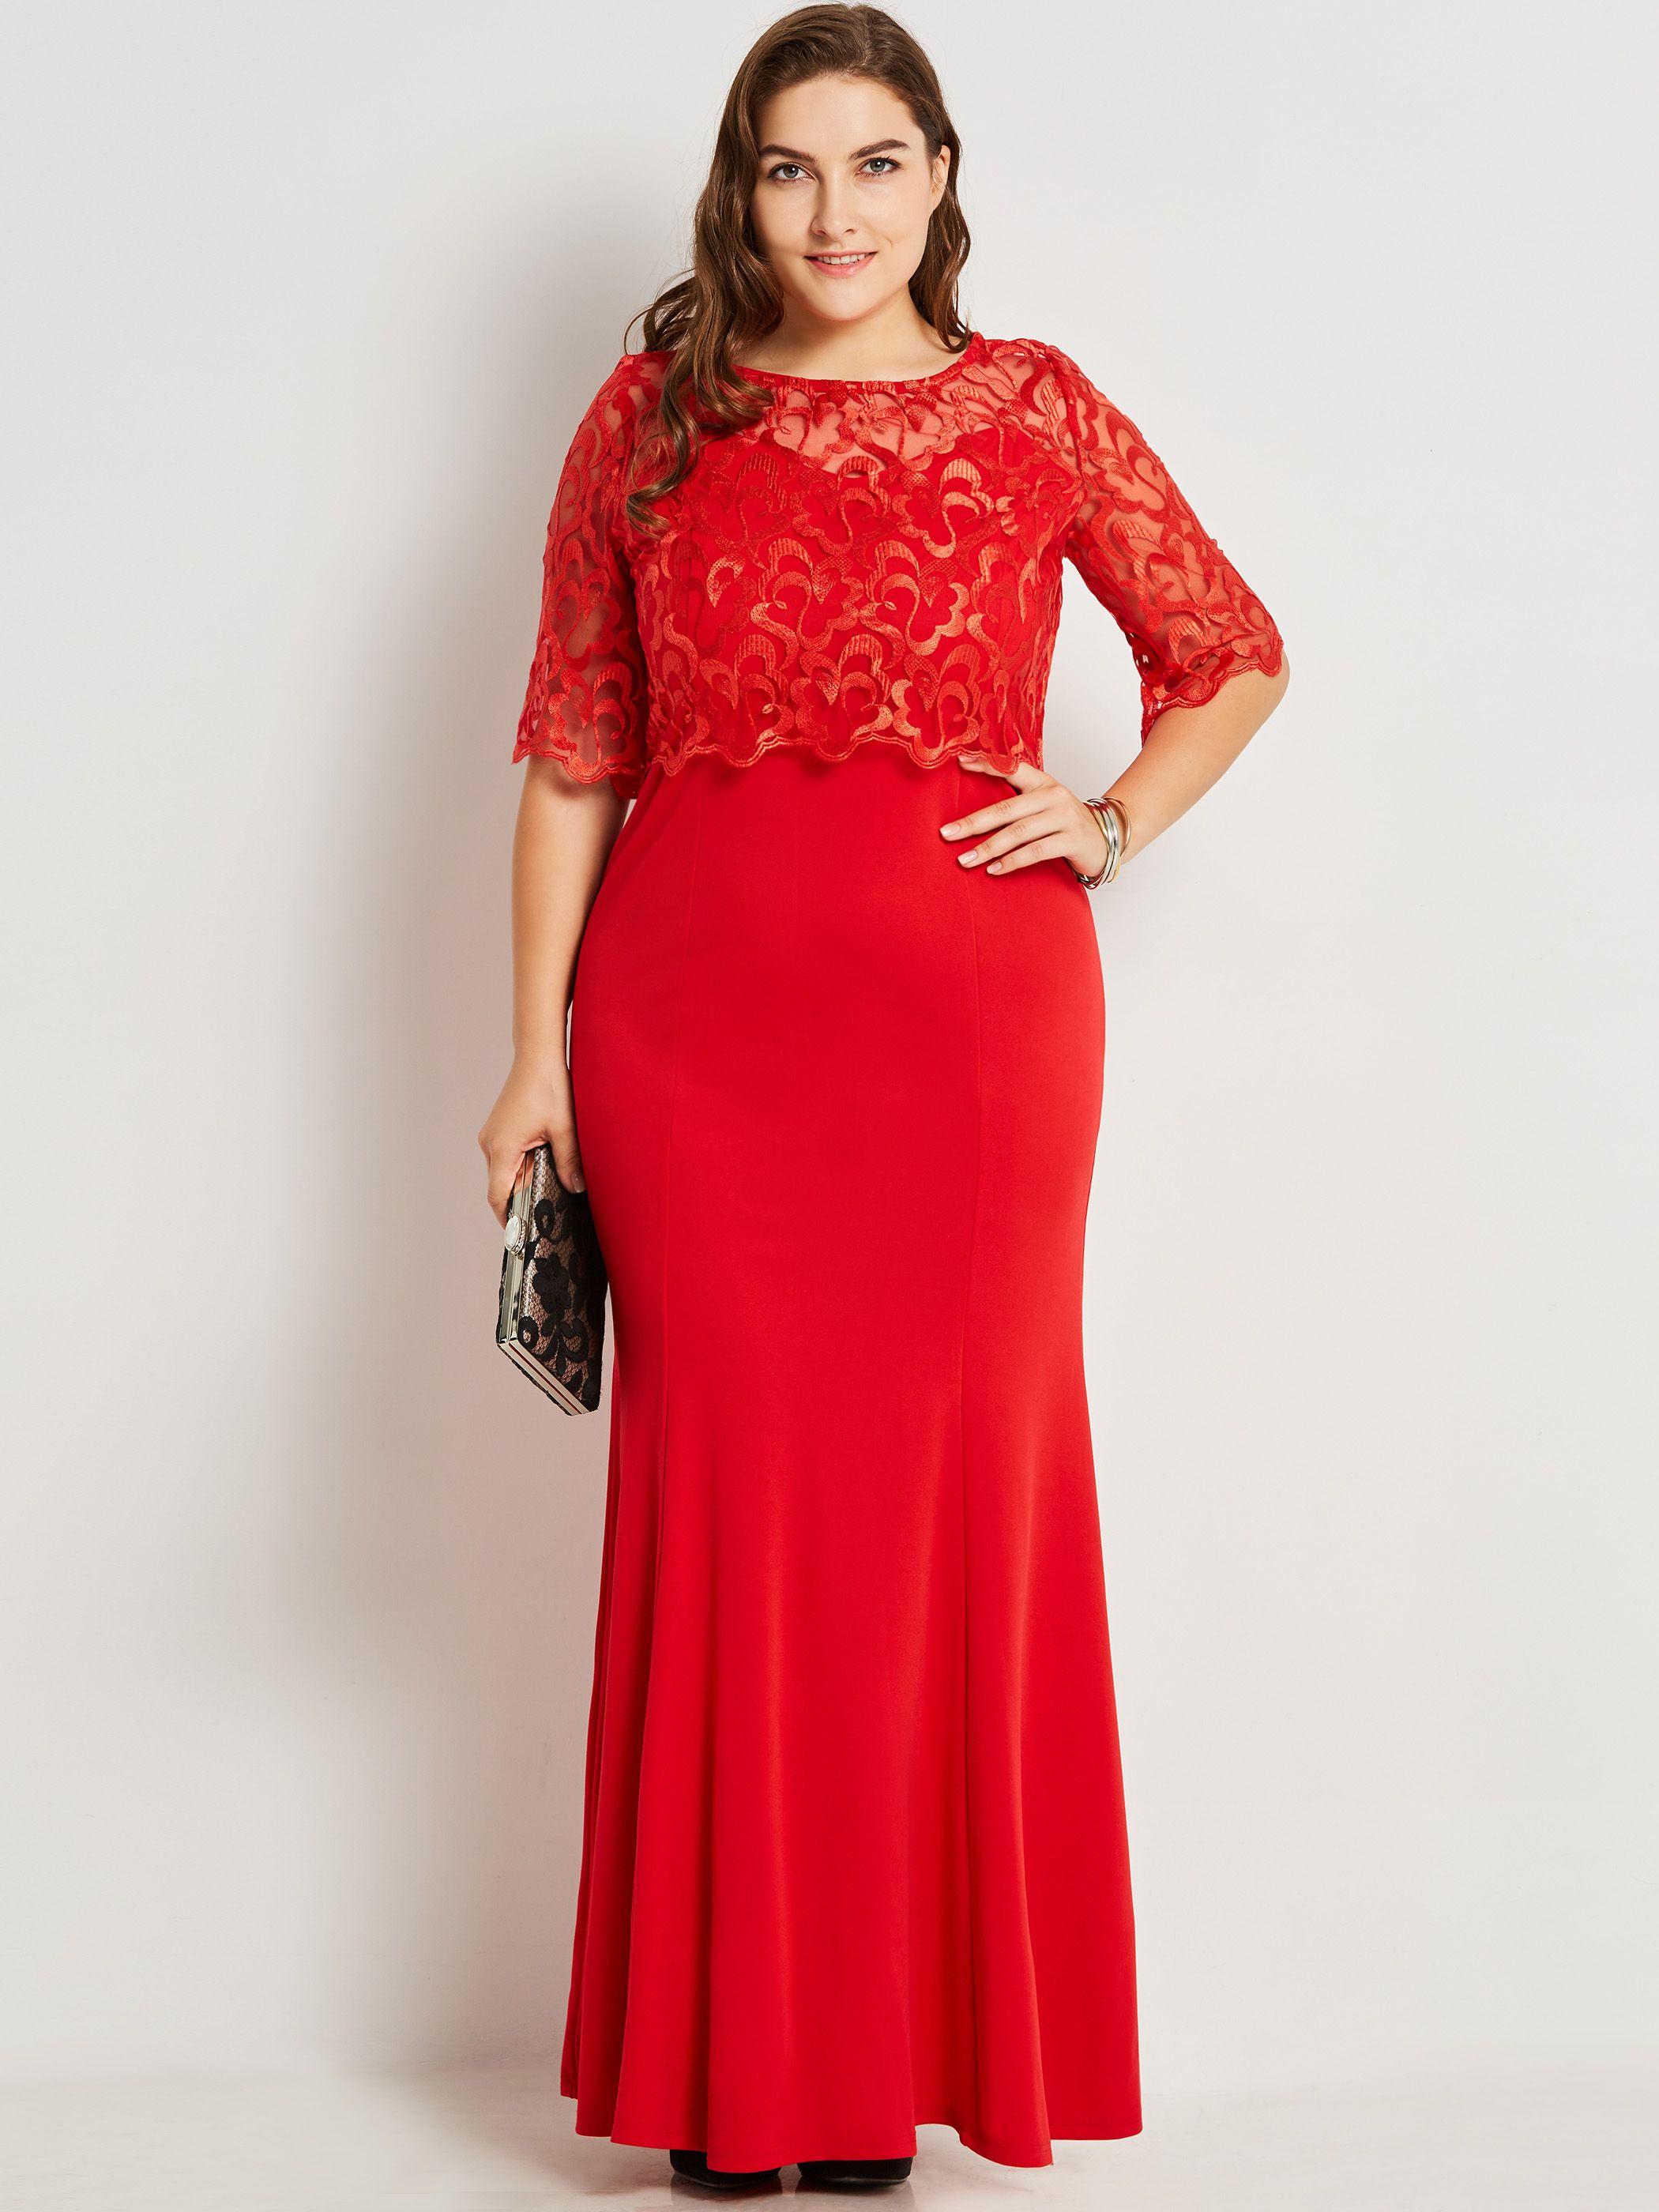 Red dress Vestidos, Looks plus size, Moda evangelica